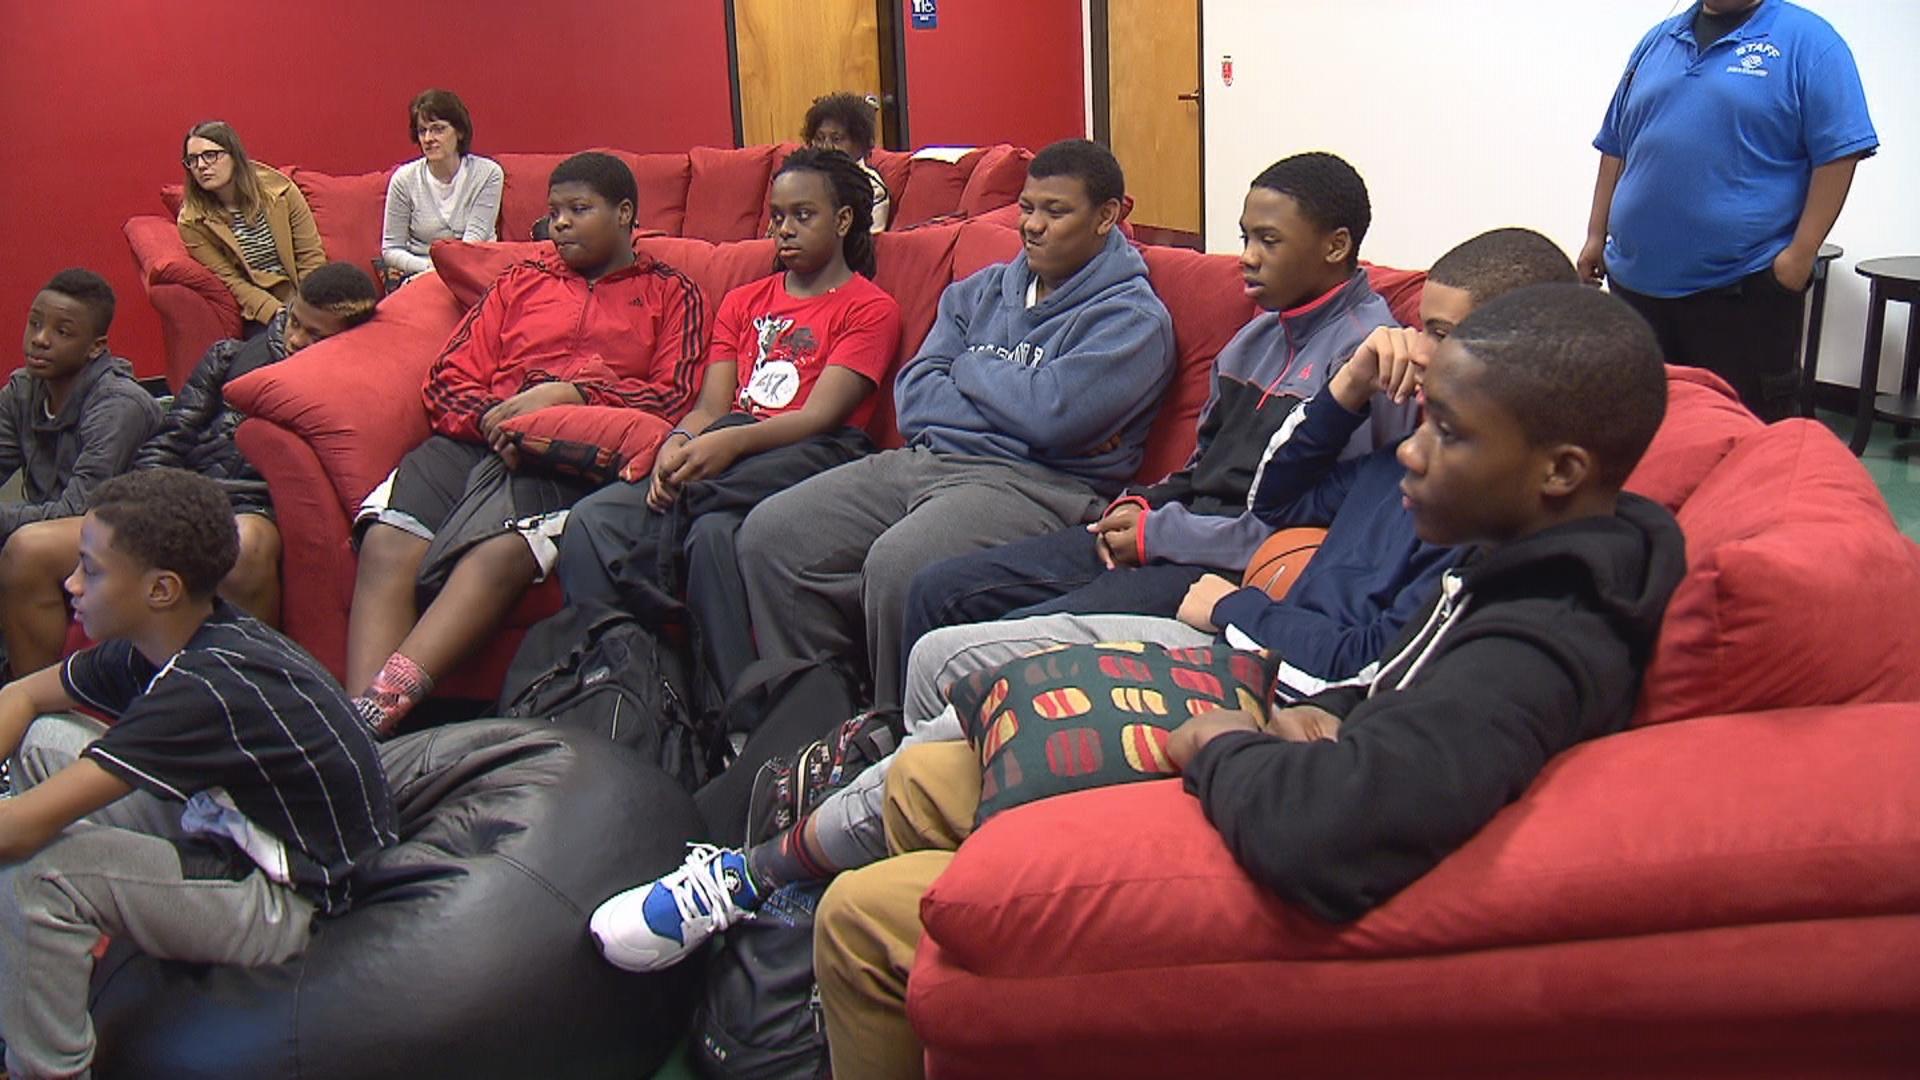 Kids at Portland Boys and Girls Club discuss social media. (KOIN 6 News)